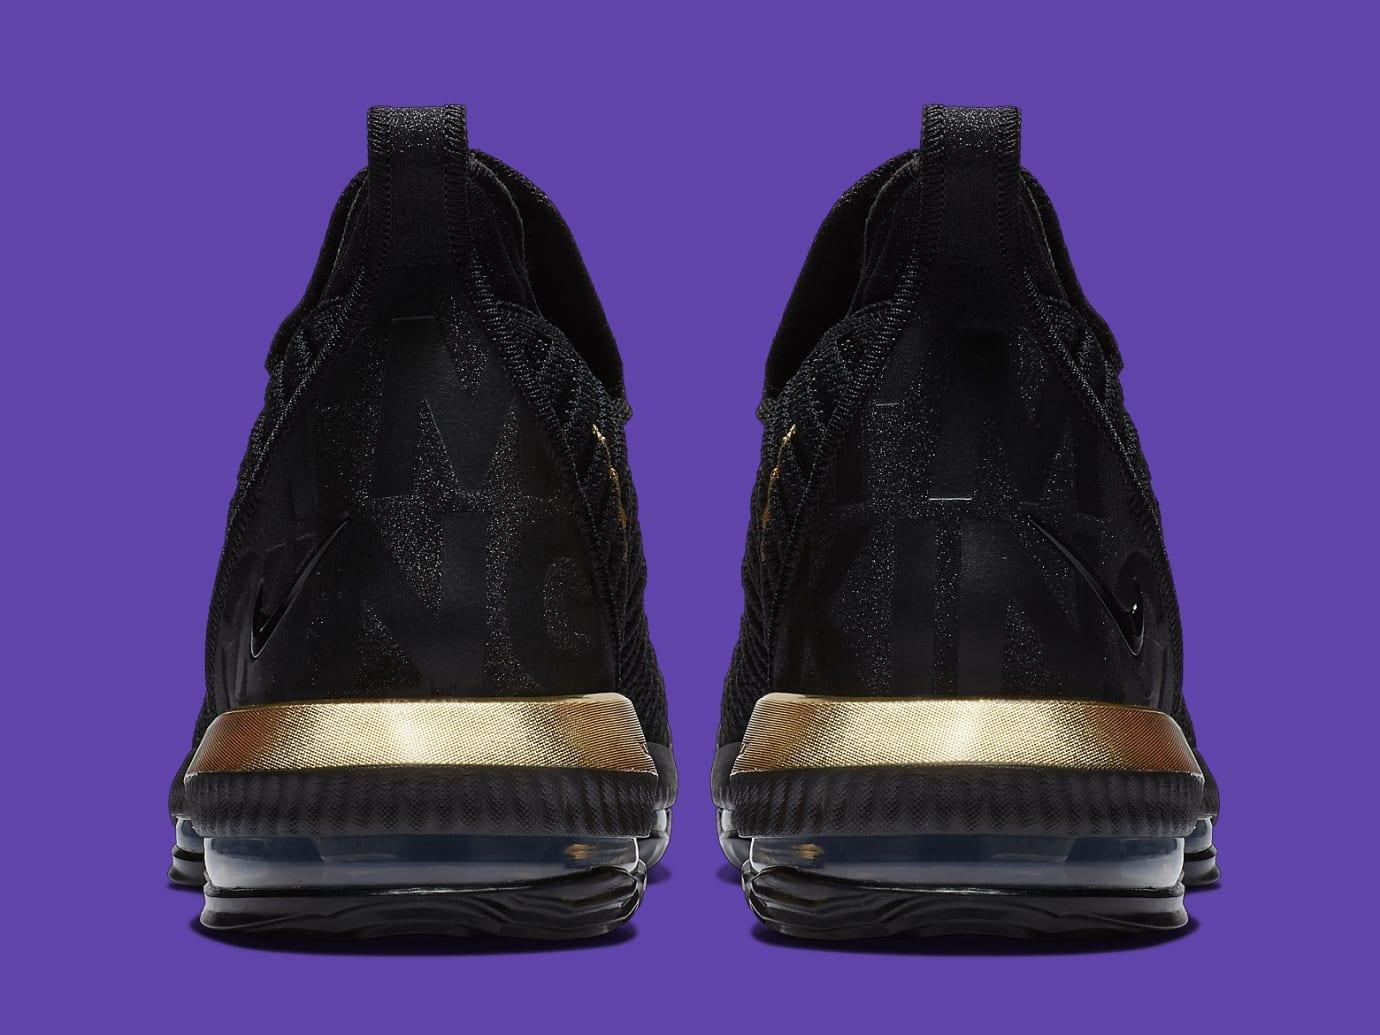 online retailer d7863 84155 Image via Nike Nike LeBron 16 XVI I m King Release Date BQ5970-007 Heel